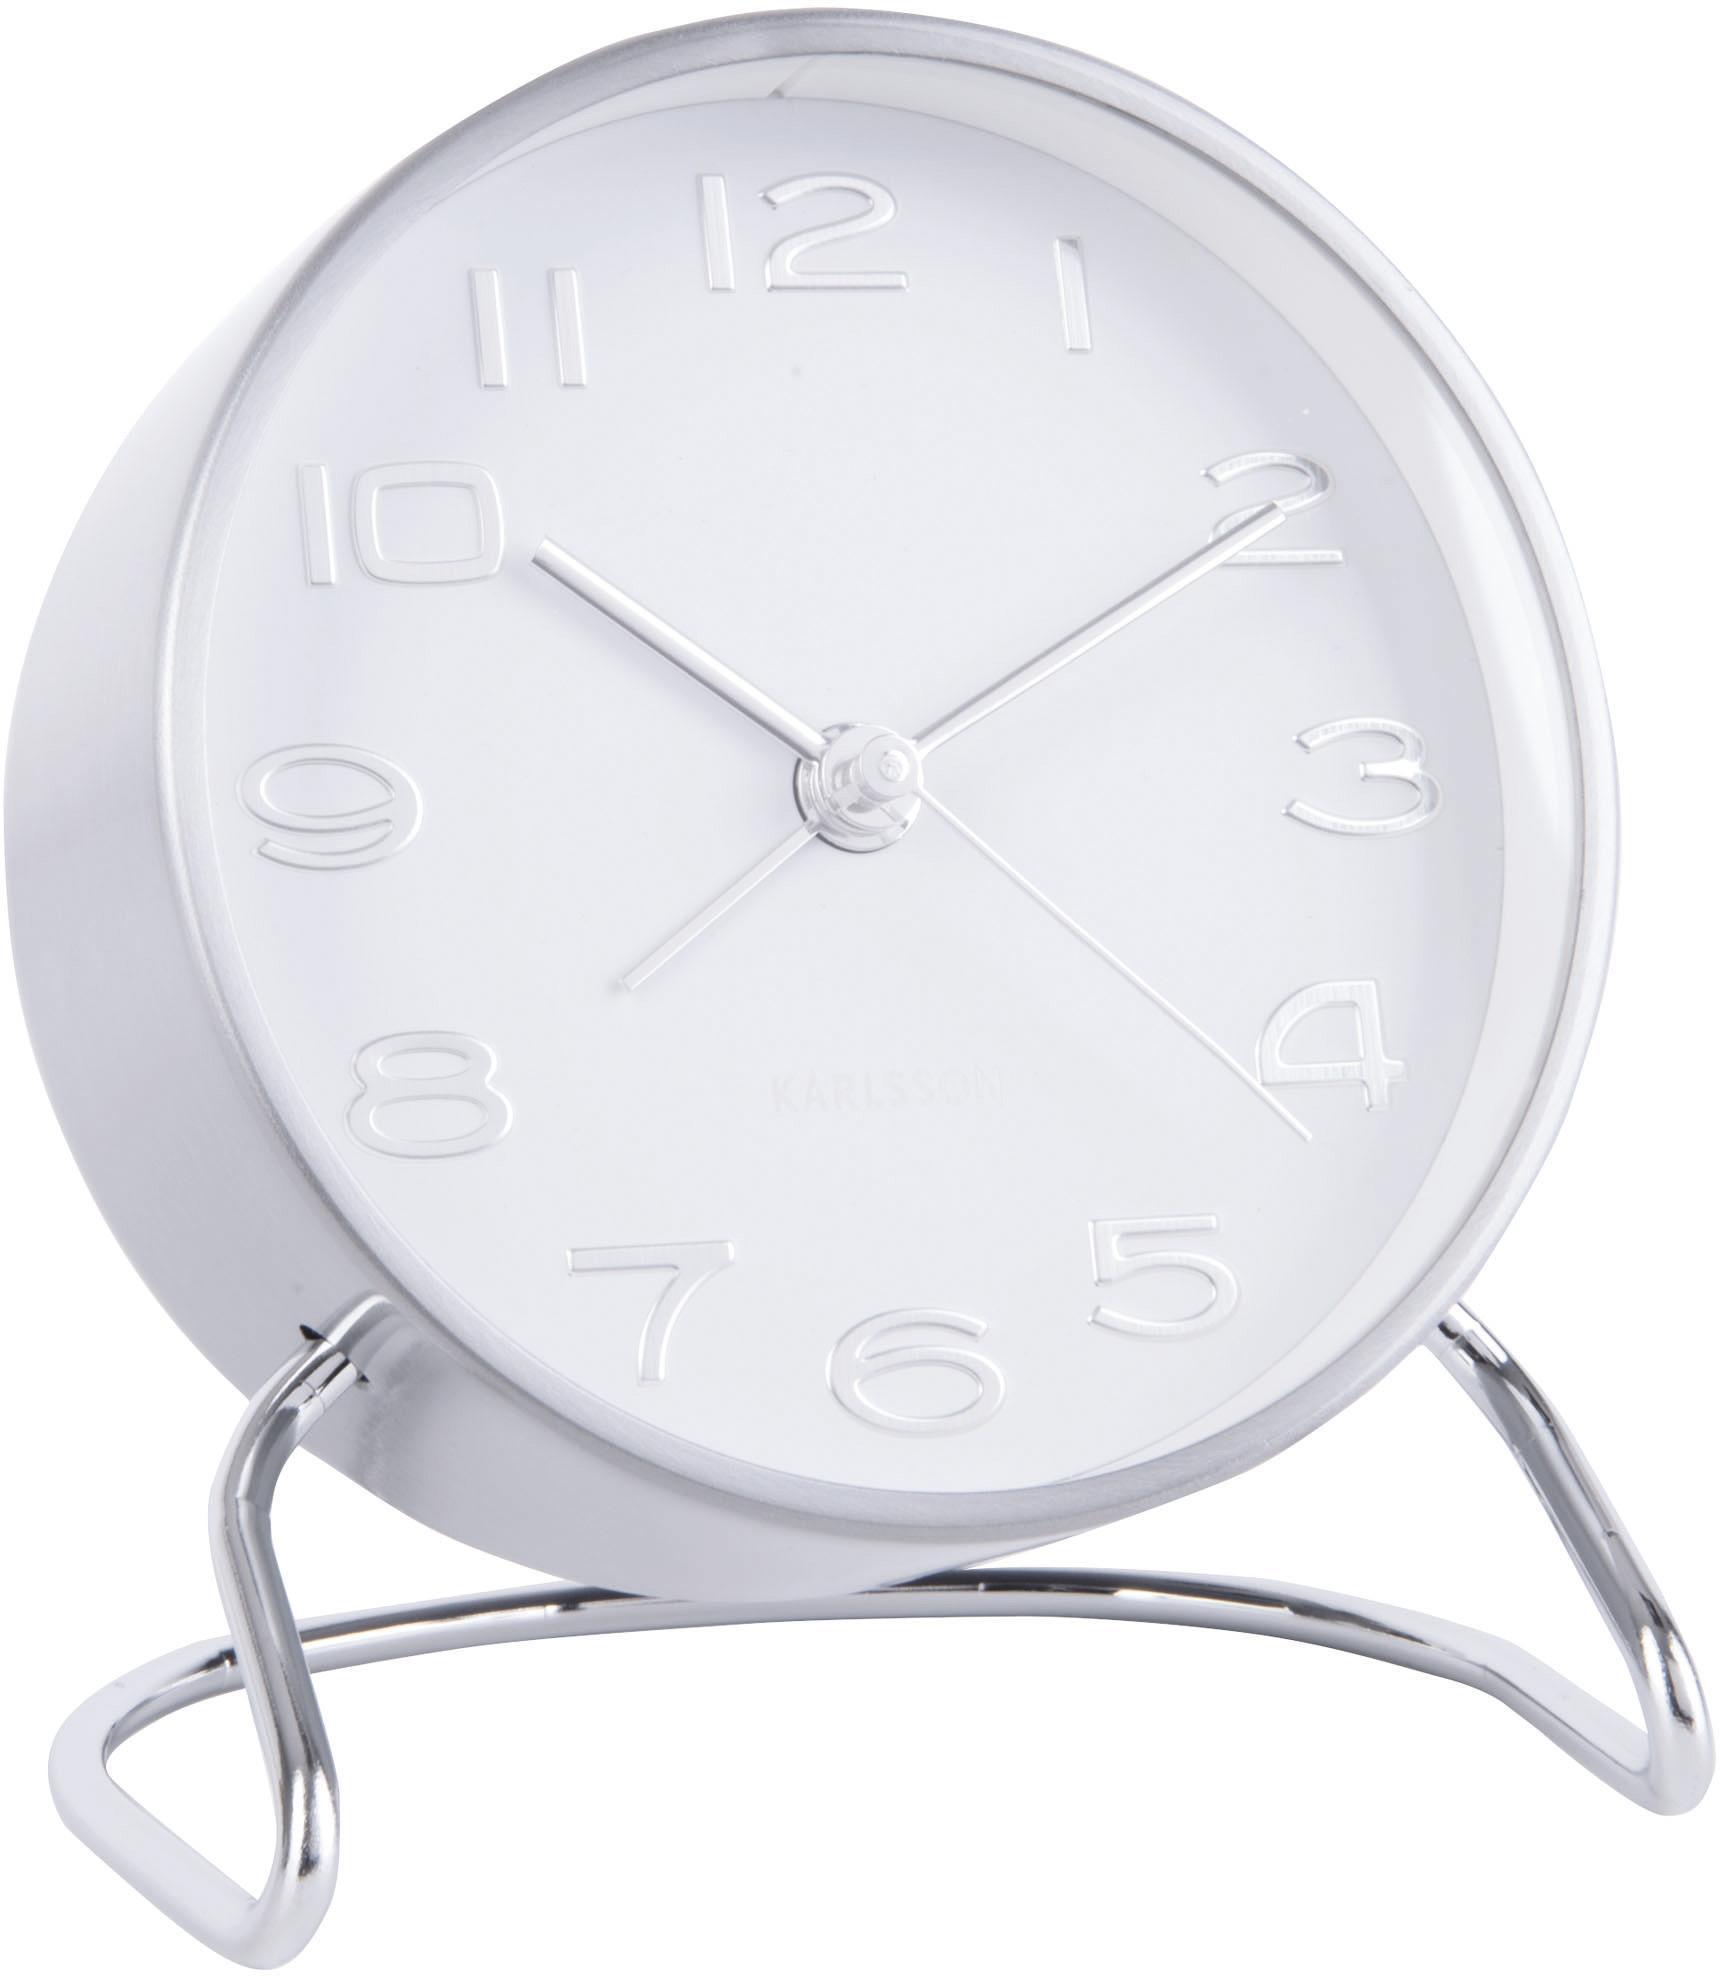 Wekker Classical, Gecoat metaal, Chroomkleurig, wit, Ø 10 cm